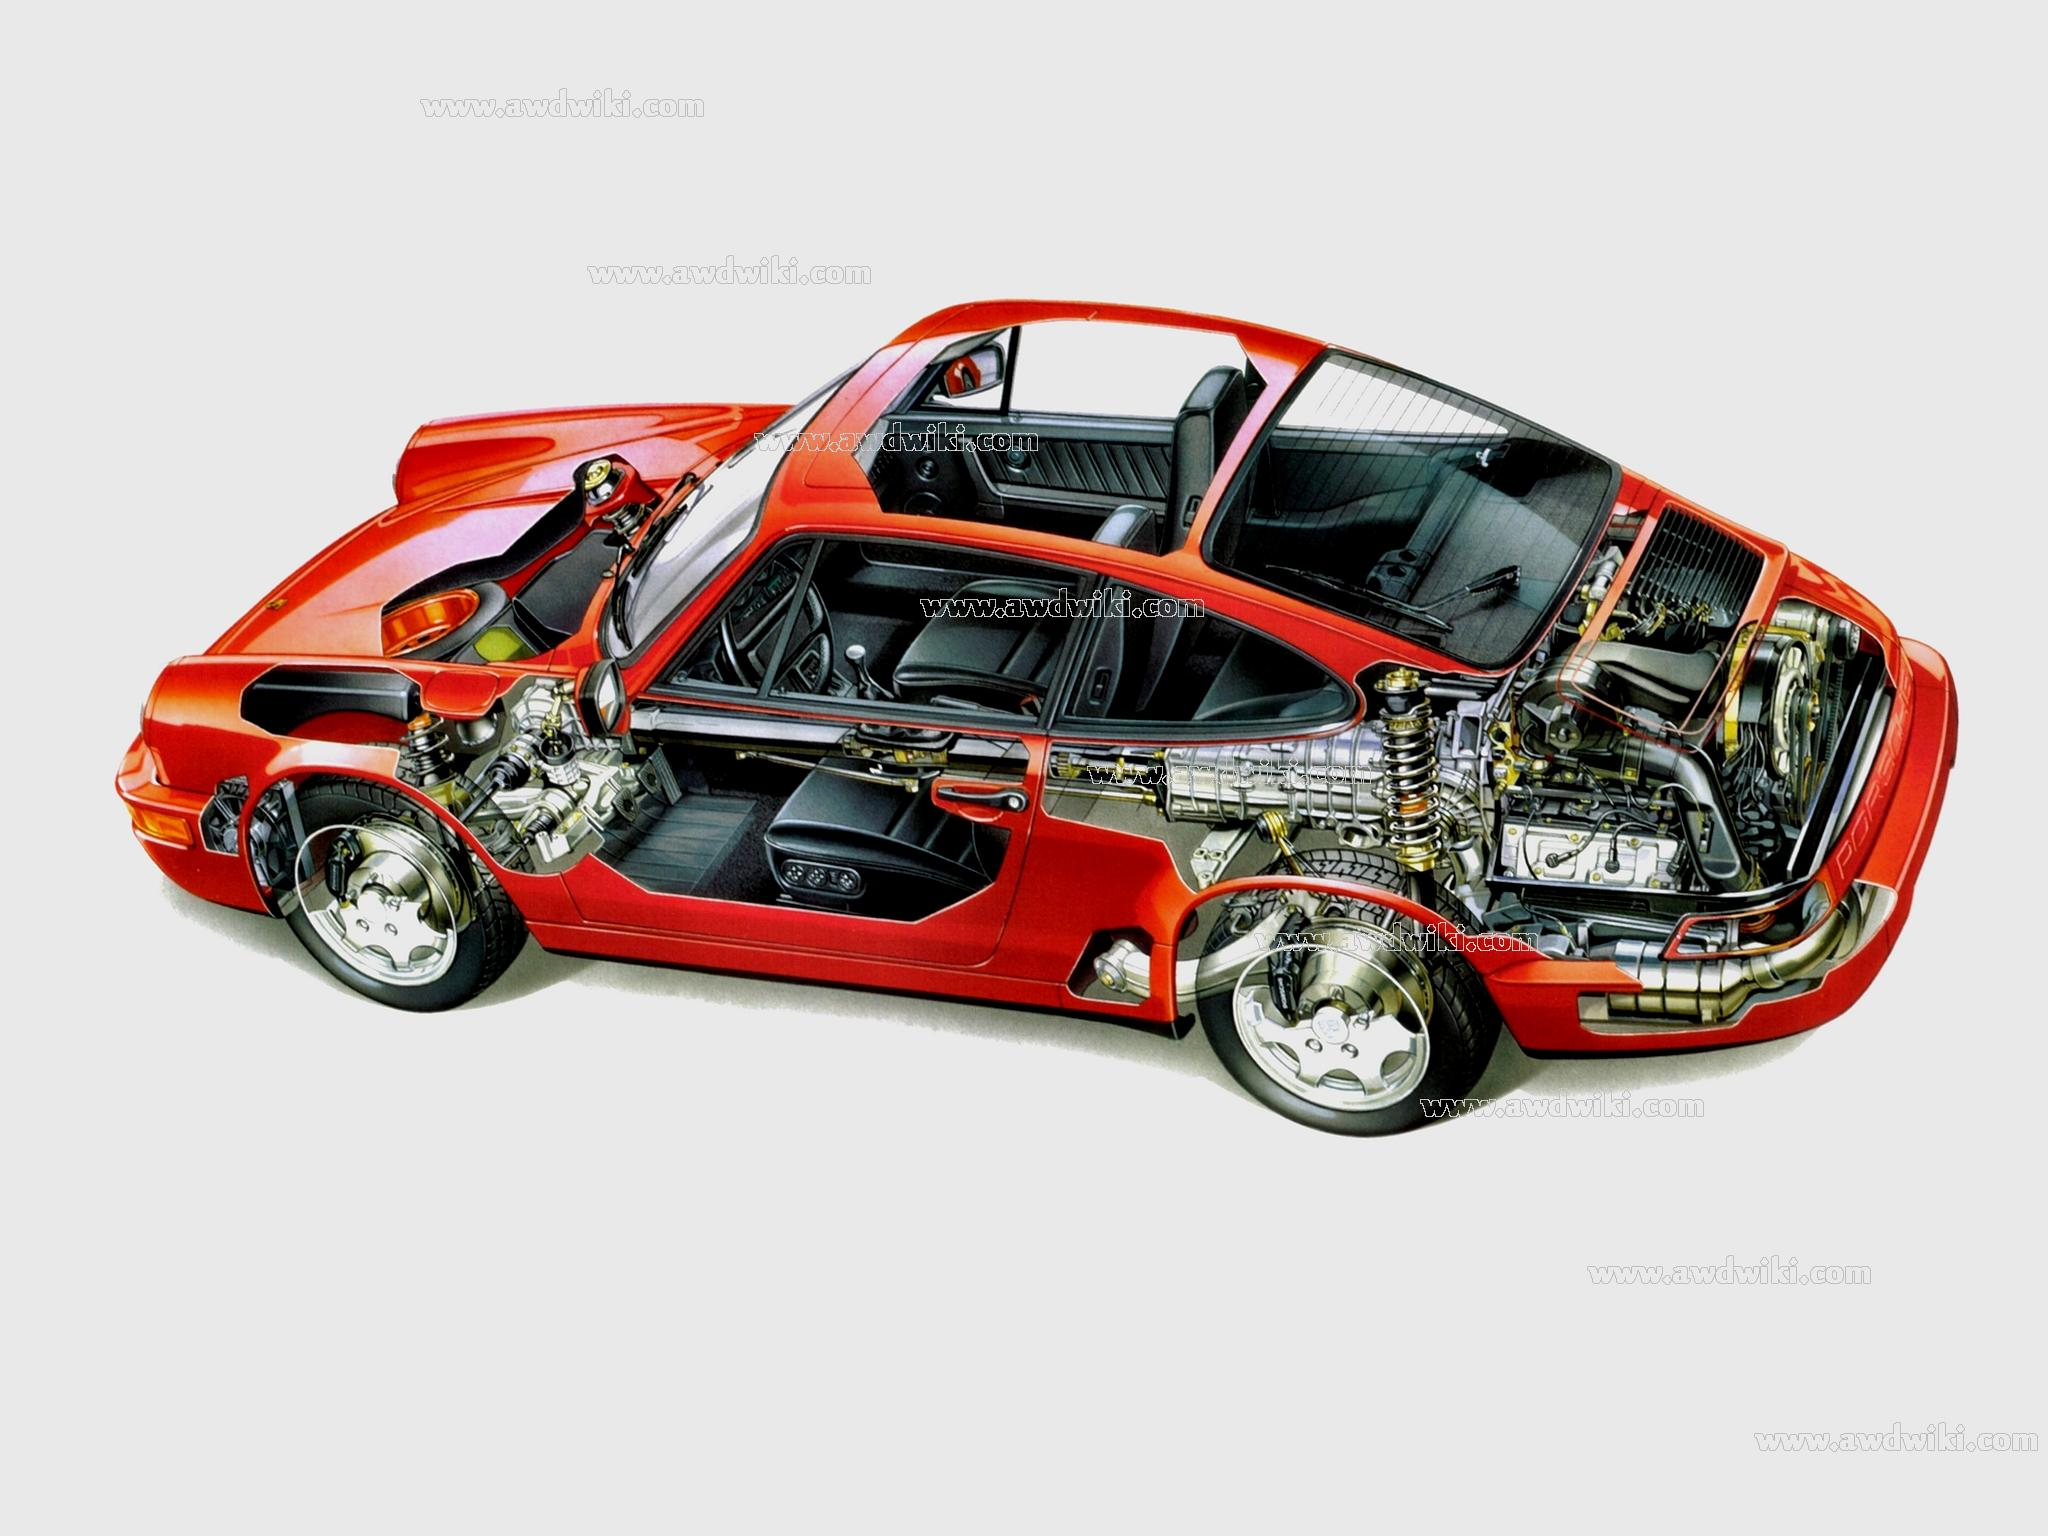 Porsche all wheel drive explained